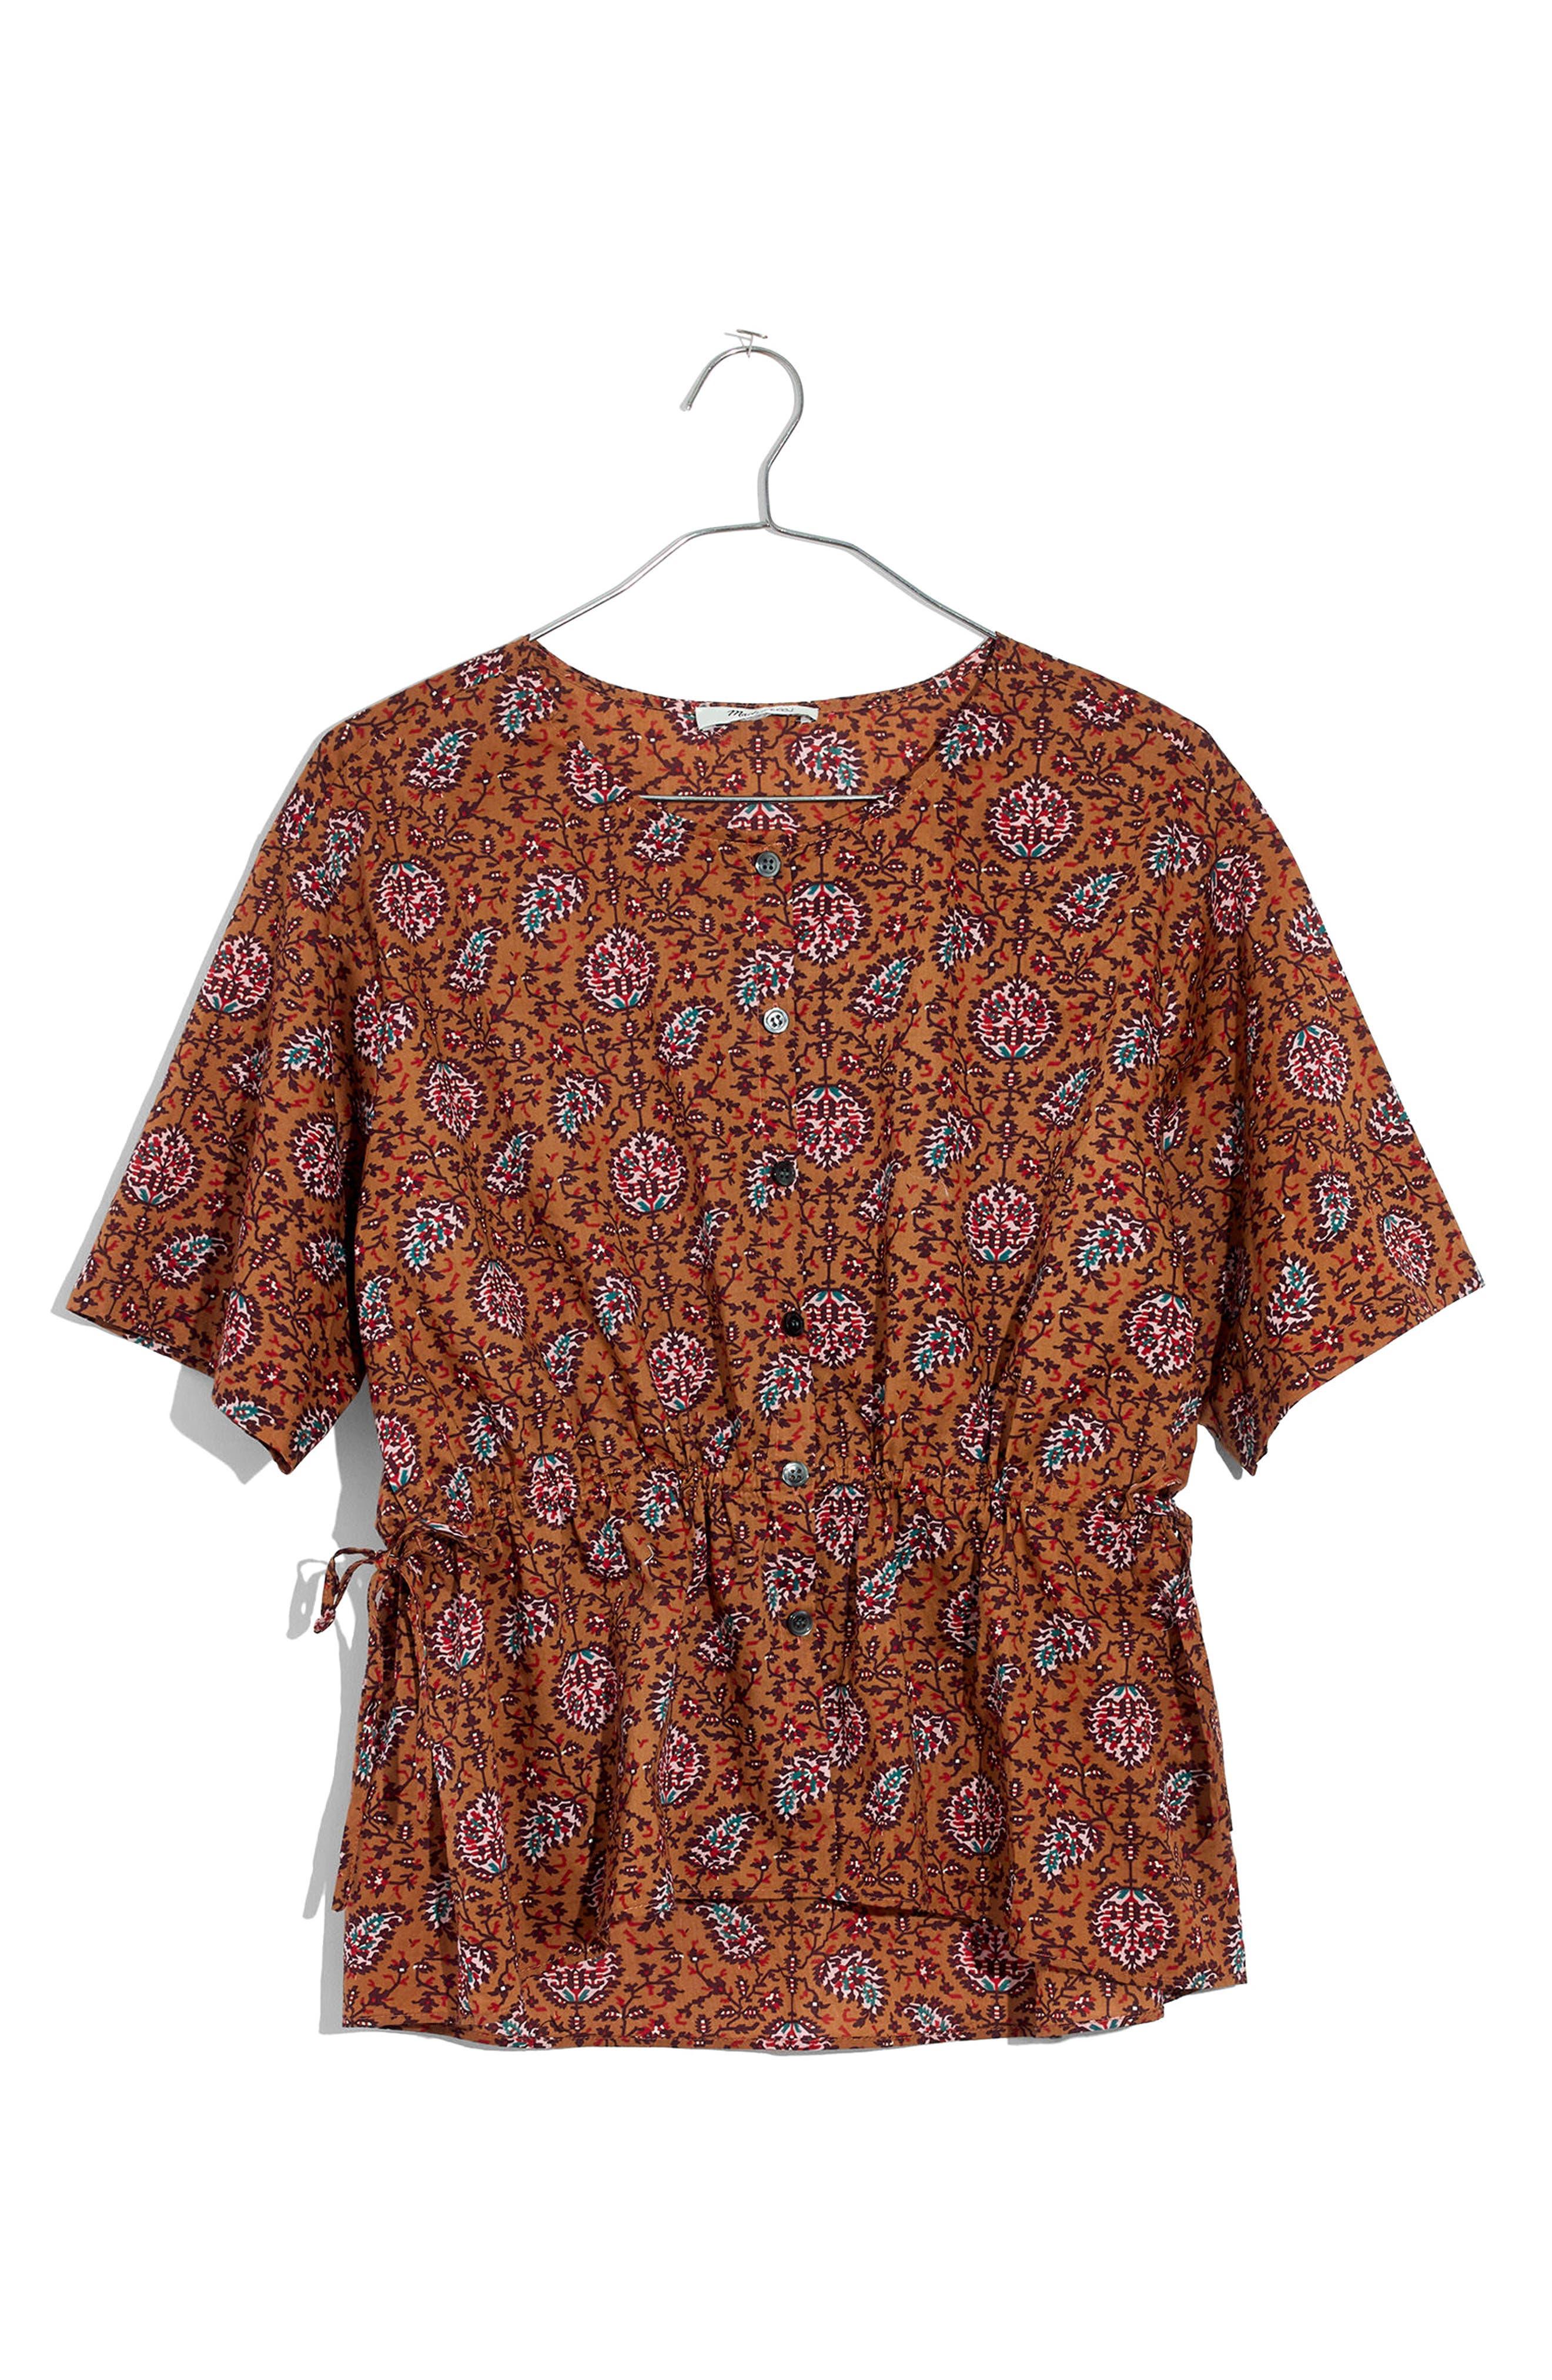 Drawstring Waist Shirt,                             Alternate thumbnail 4, color,                             Burnt Sienna